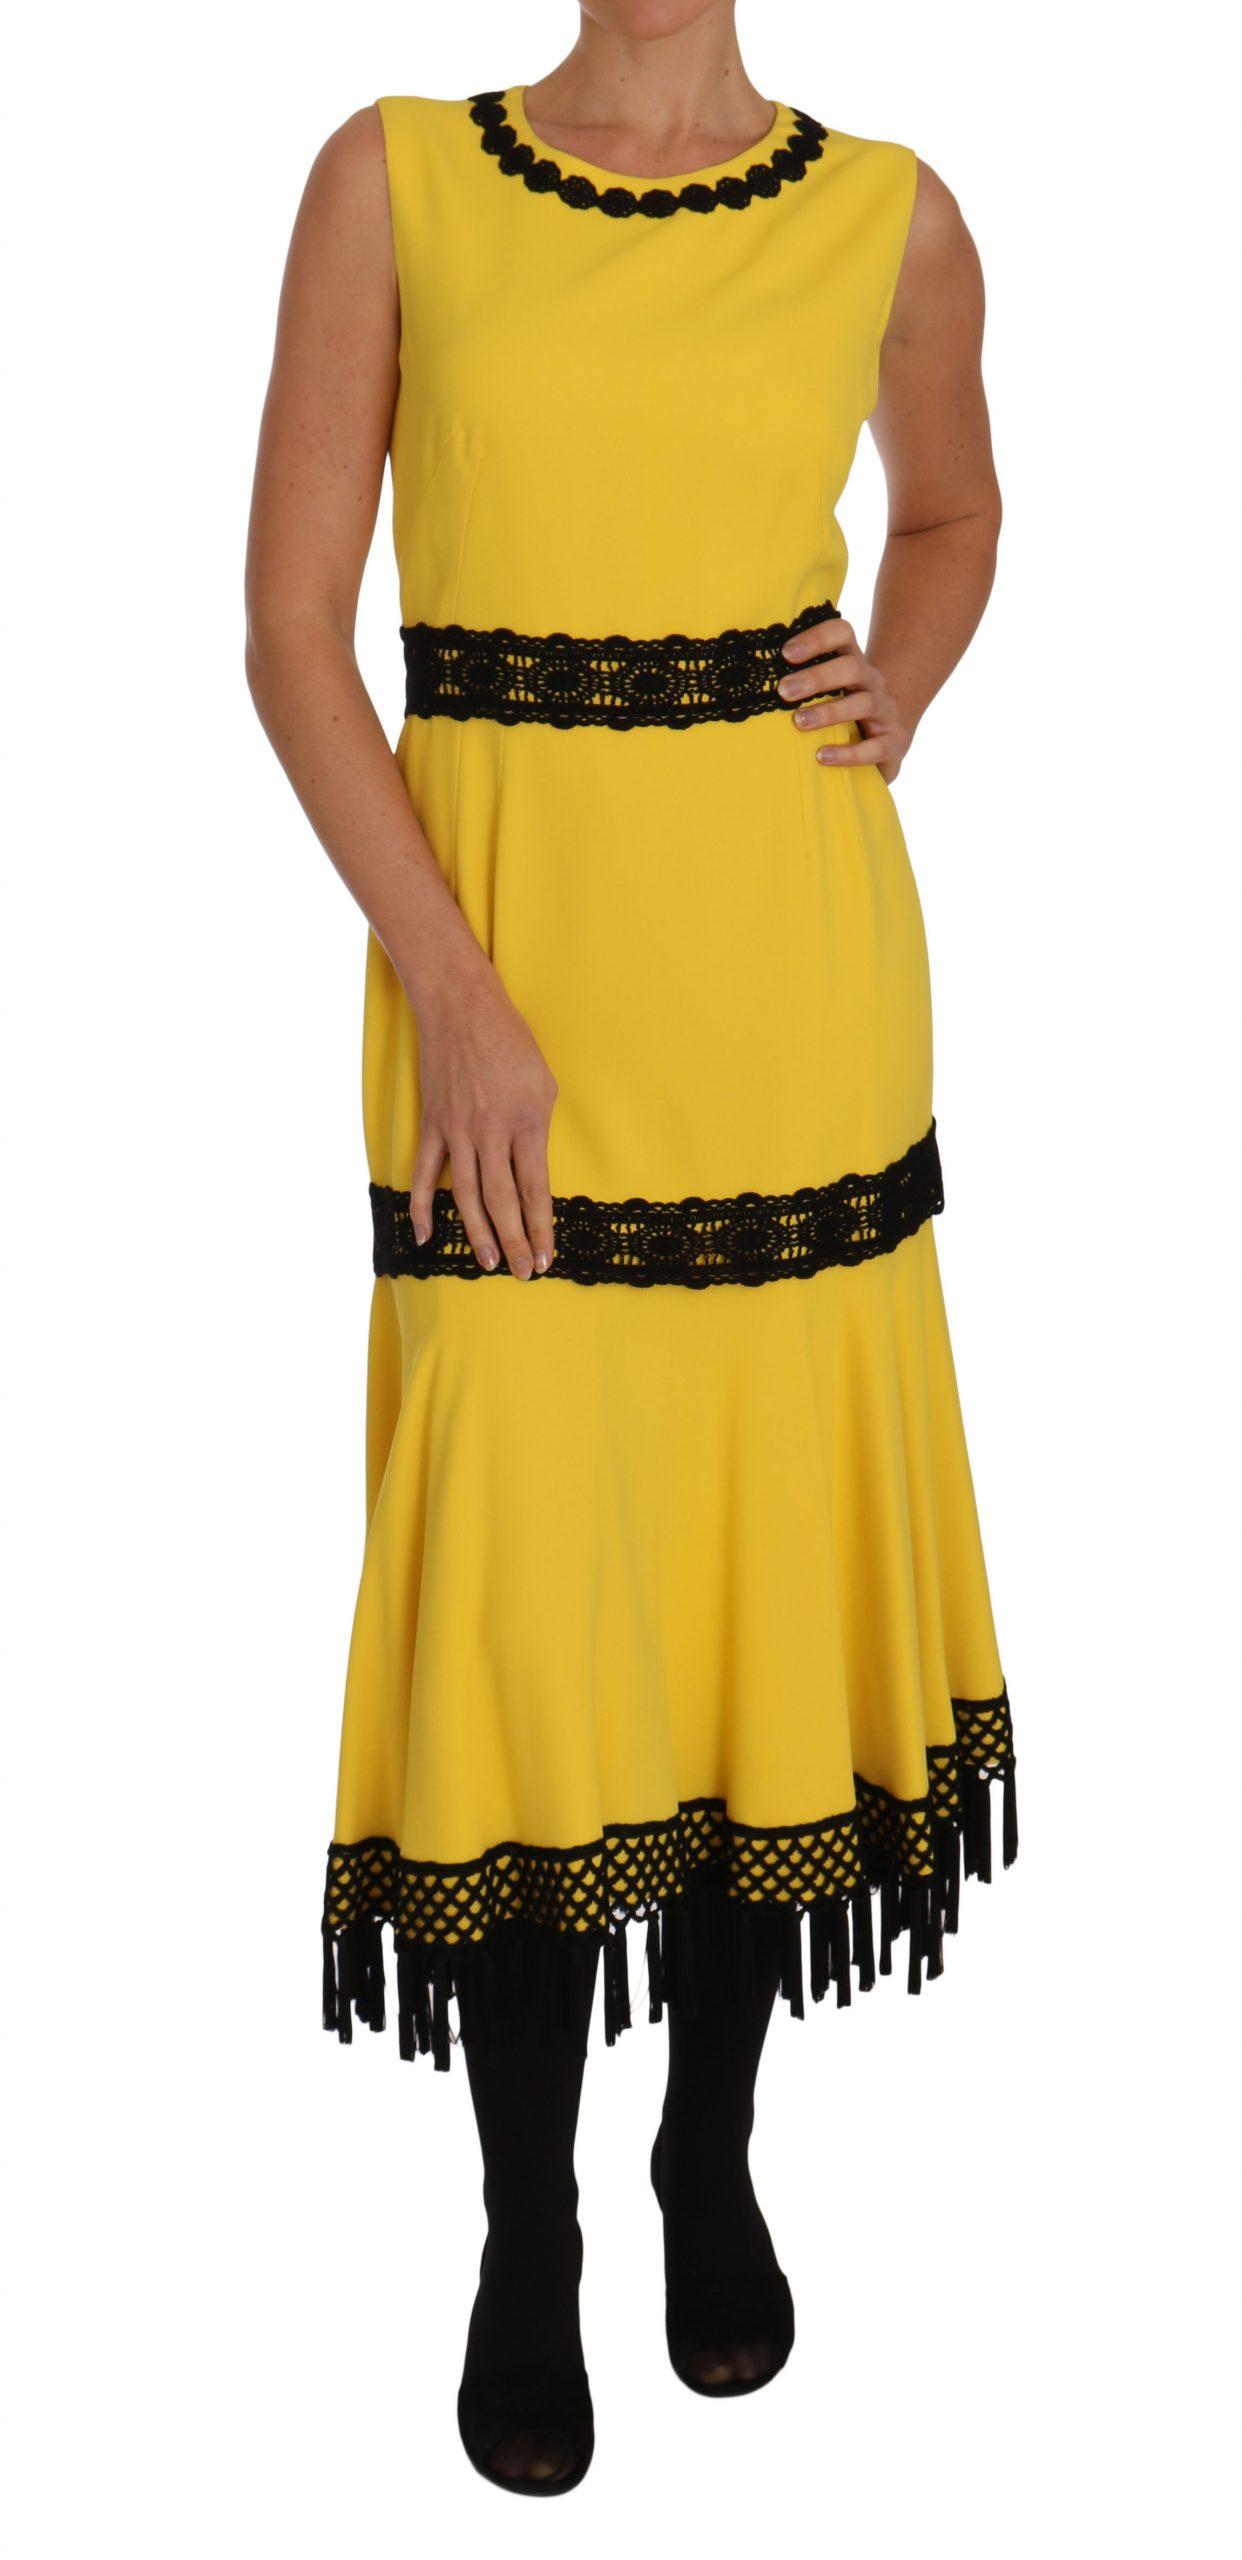 Dolce & Gabbana Women's Dress Floral Lace Fringes Sheath Dress Yellow DR1468 - IT46 | L